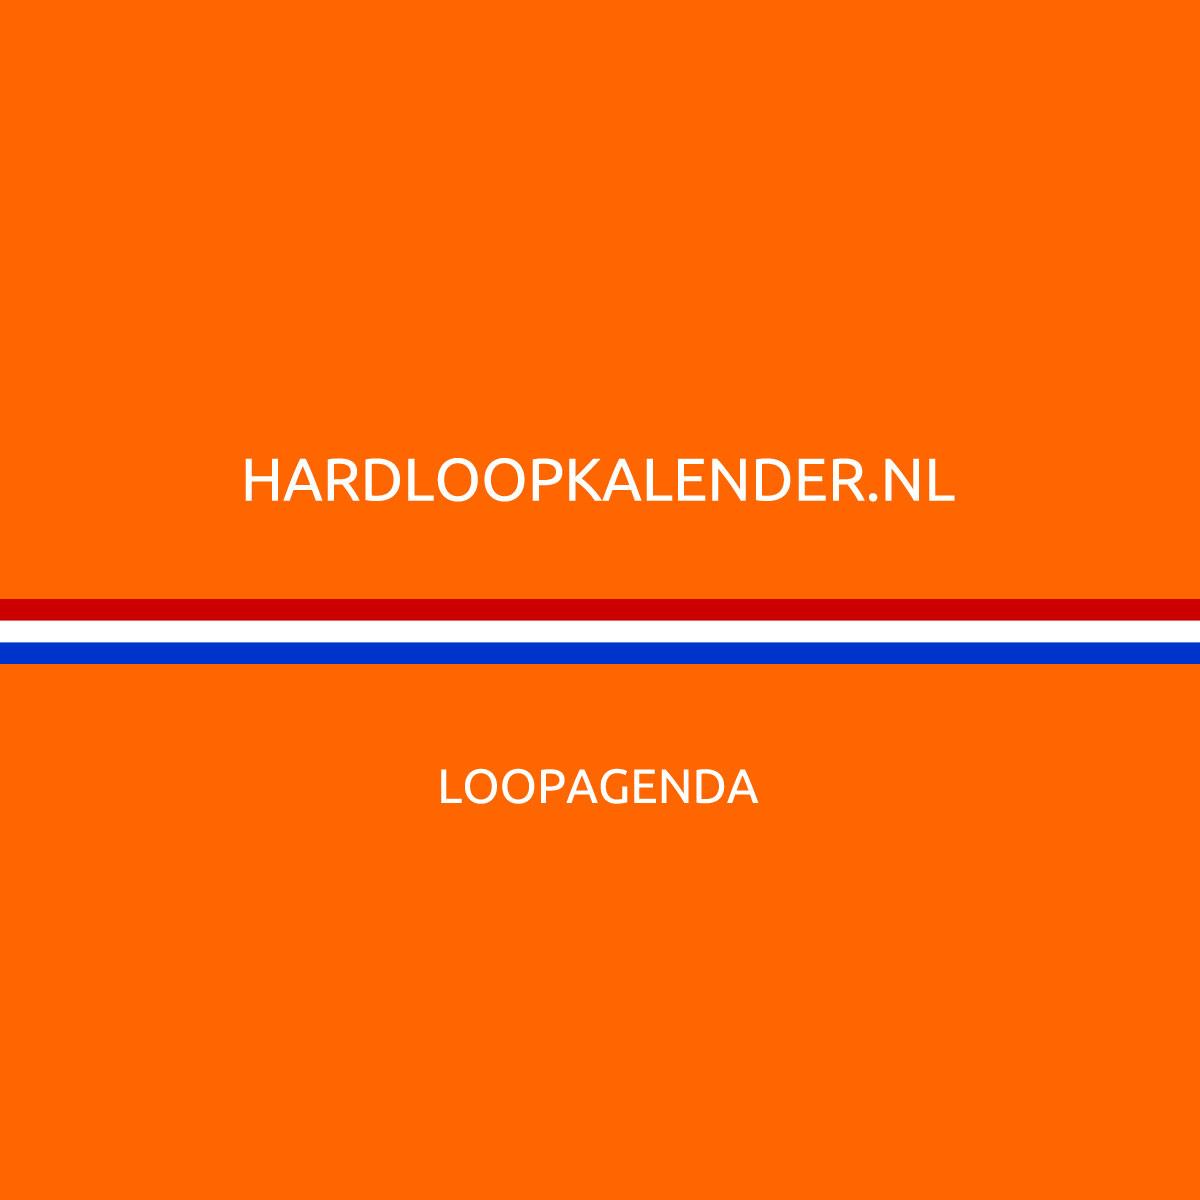 (c) Hardloopkalender.nl